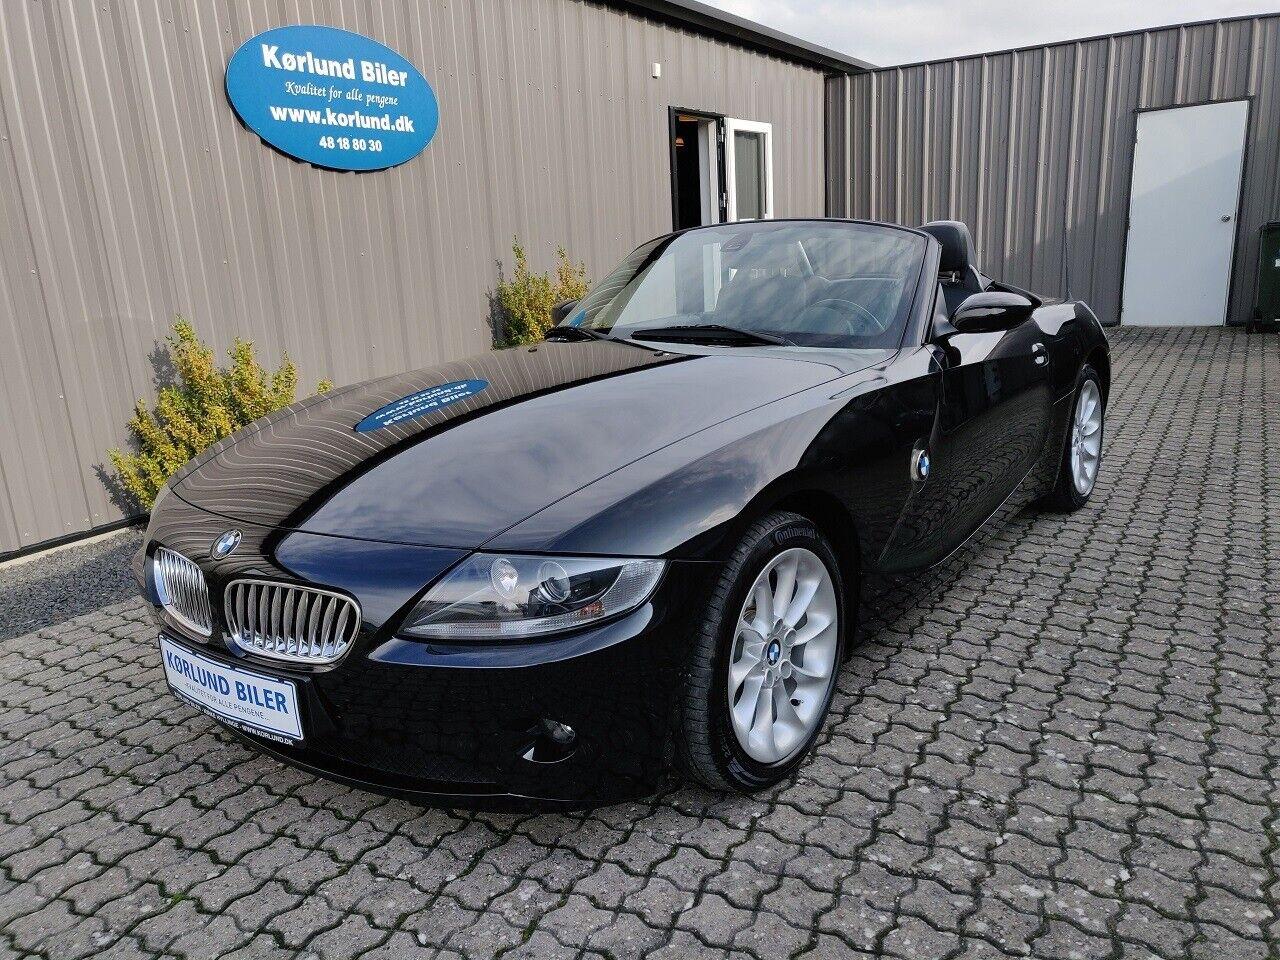 BMW Z4 2,2 Roadster 2d